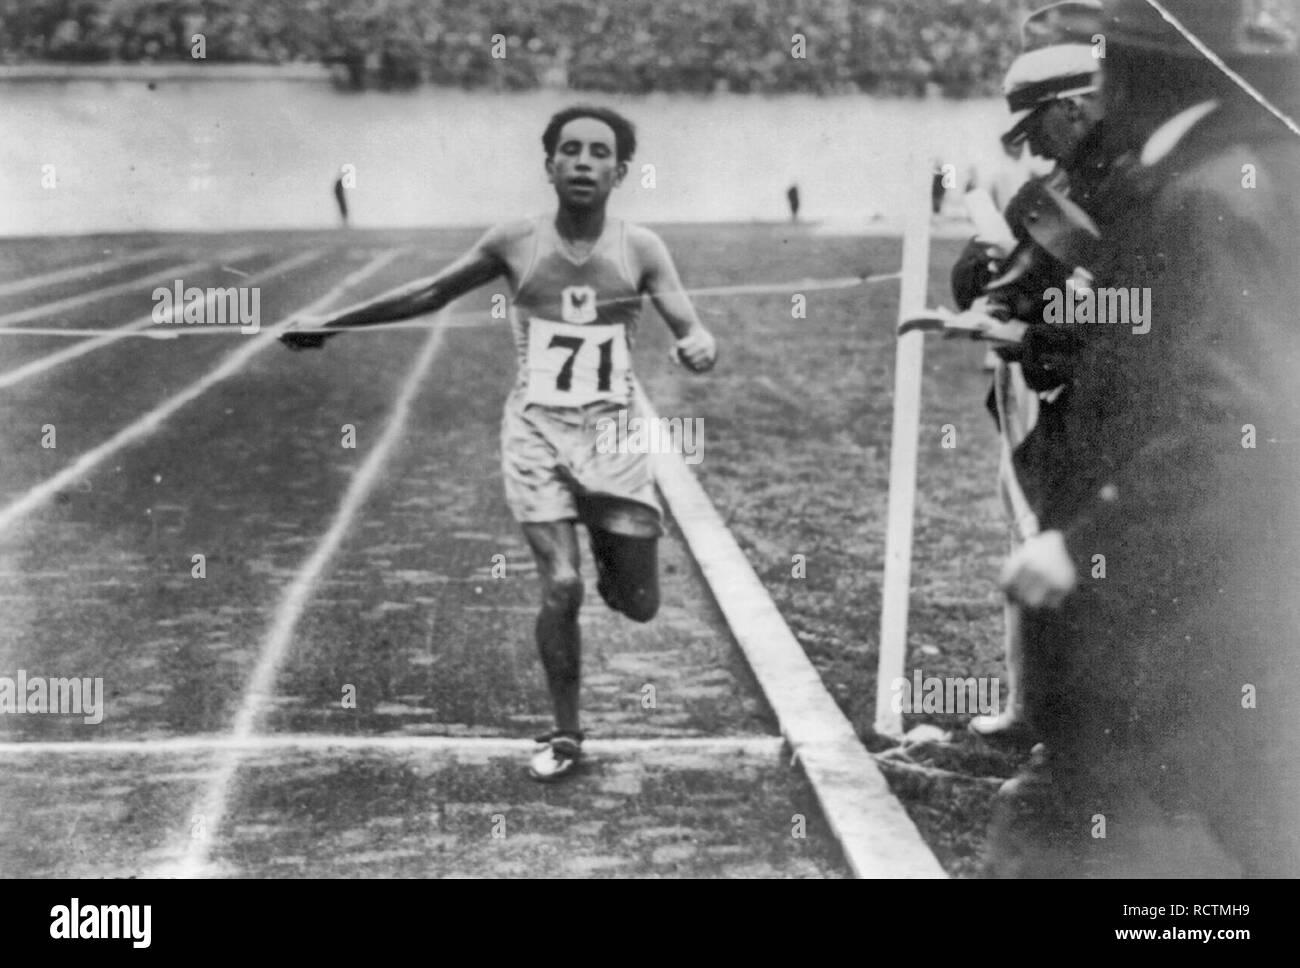 El Quafi of South Africa winning the Olympic marathon for France, 1928 - Stock Image